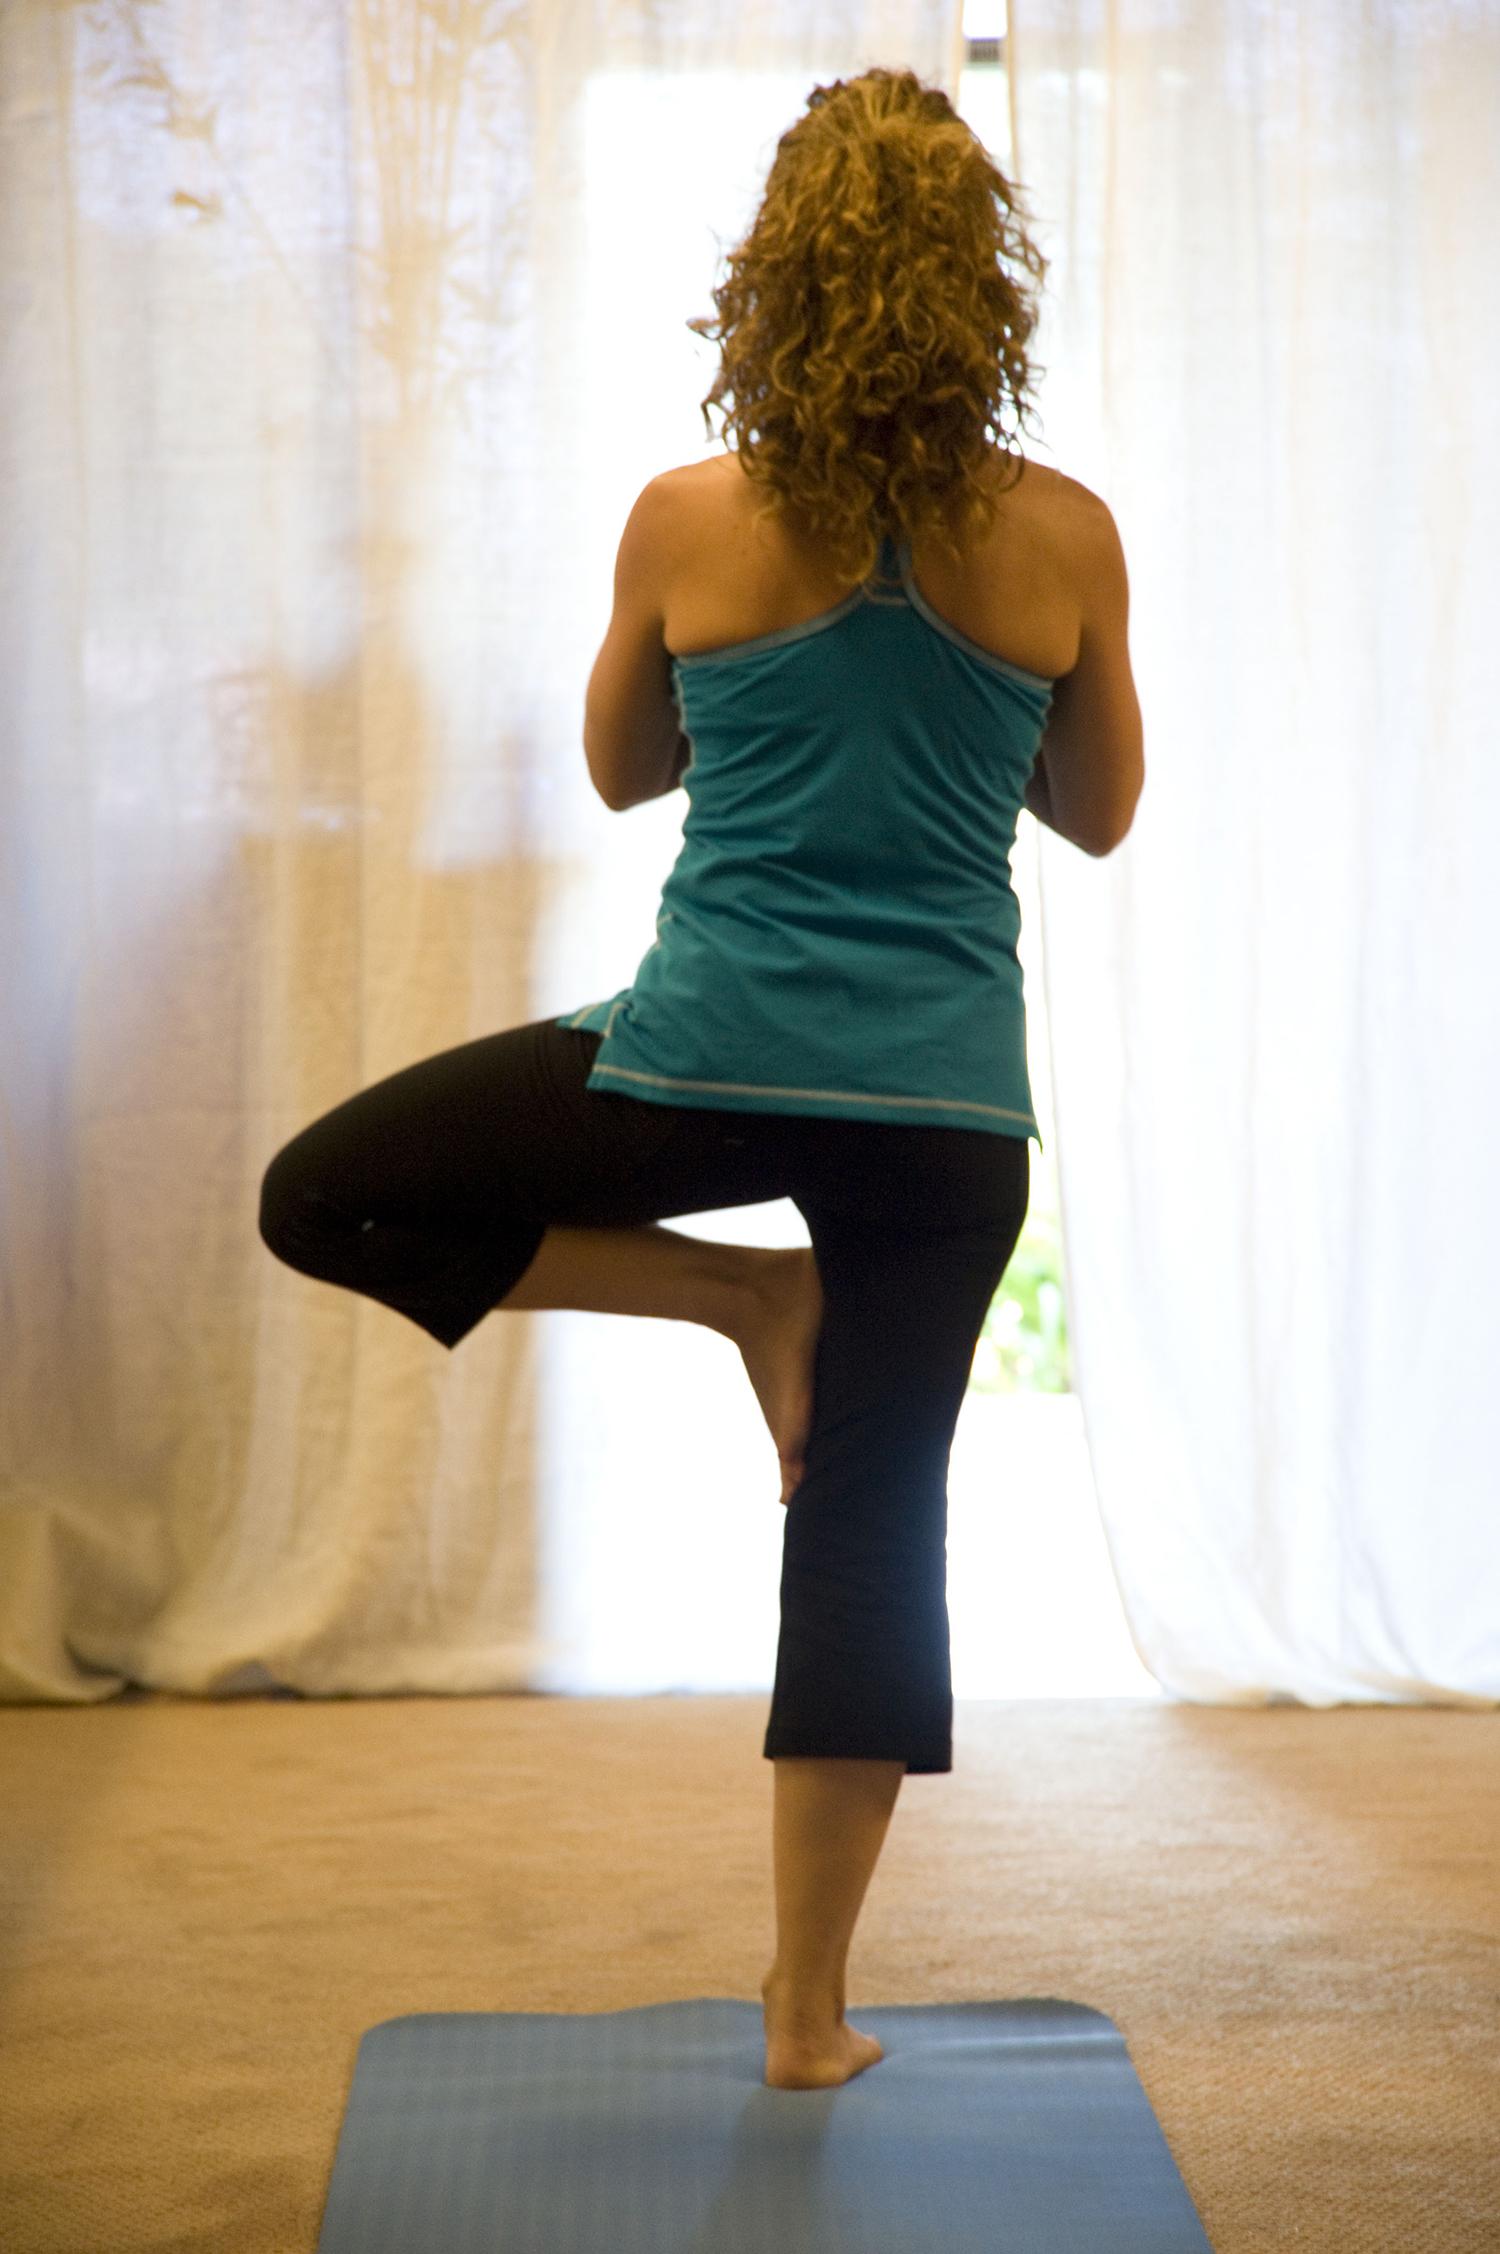 Fit Woman Doing Tree Pose. Balance Yoga Pose